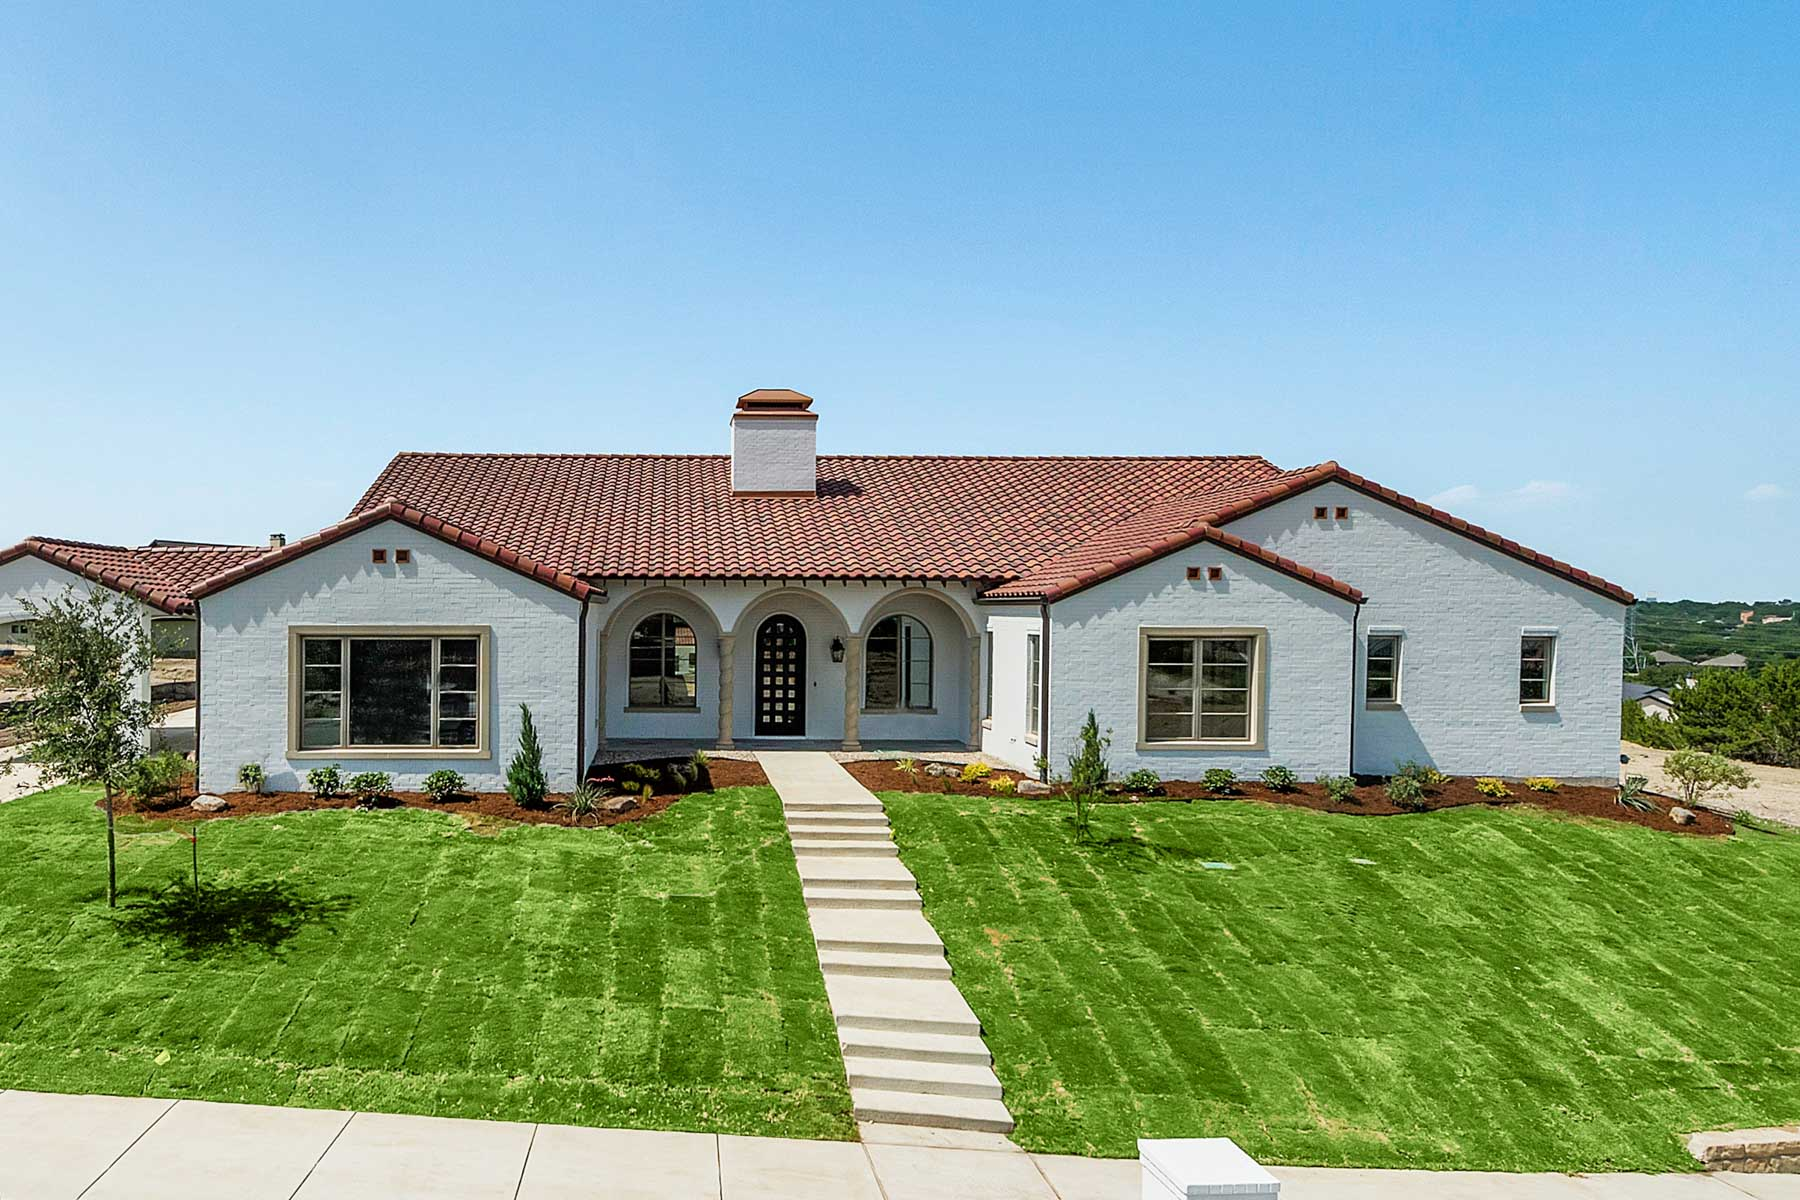 Single Family Home for Sale at Spanish, Mediterranean, La Cantera at Team Ranch 8620 E Cantera Way Benbrook, Texas, 76126 United States